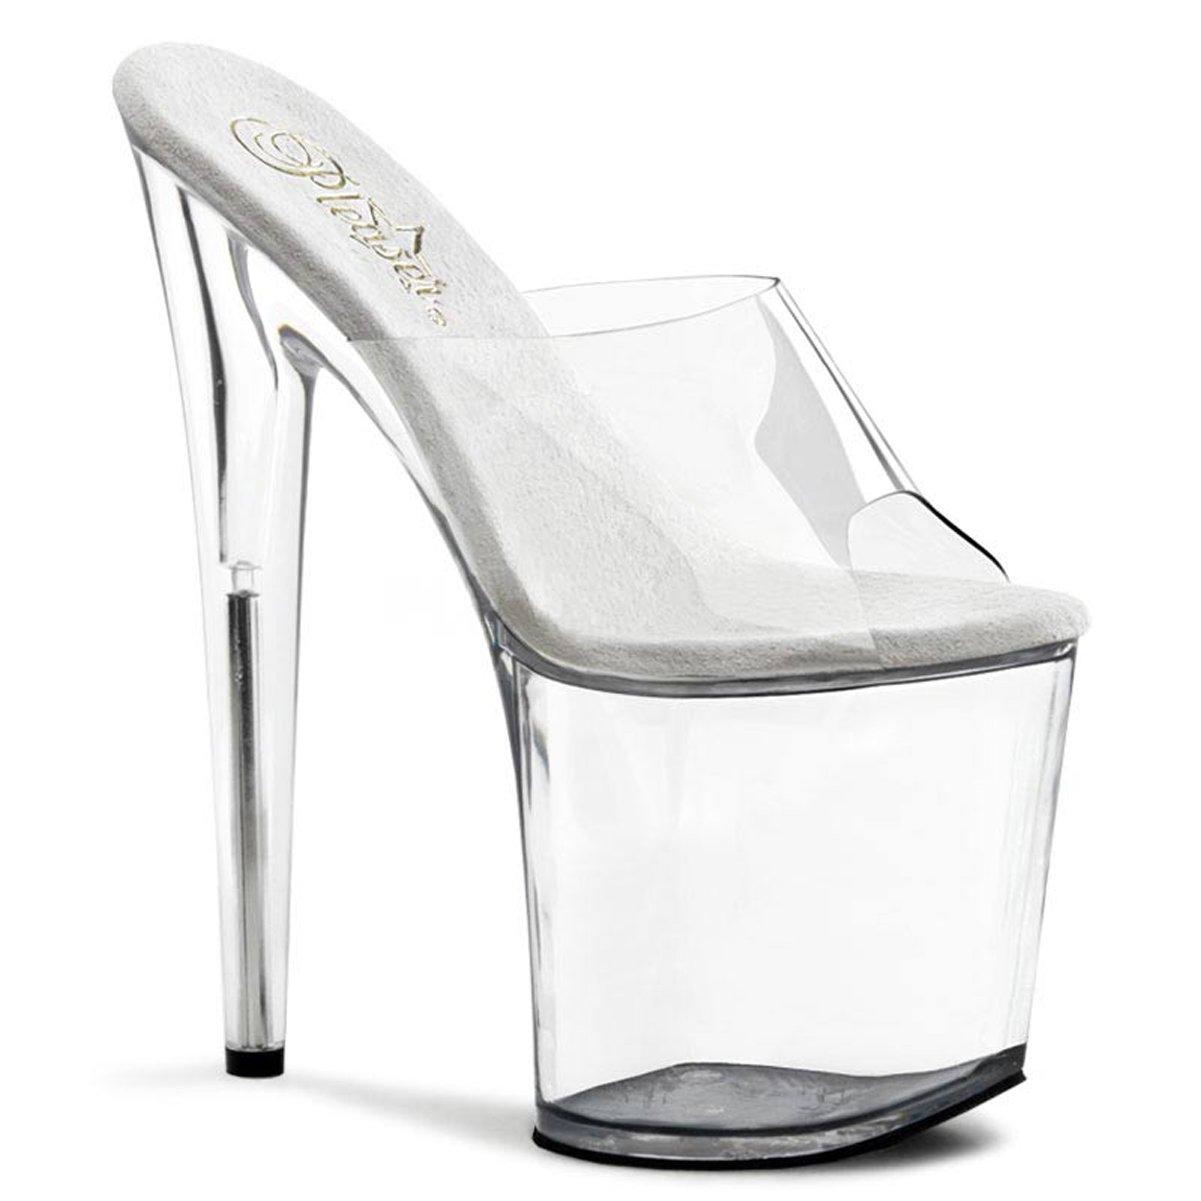 8 Inch Heel High Platform Sandal Shoe Slip On Sexy Stripper Shoes Open Toe B002XEWCP2 10 B(M) US Clear